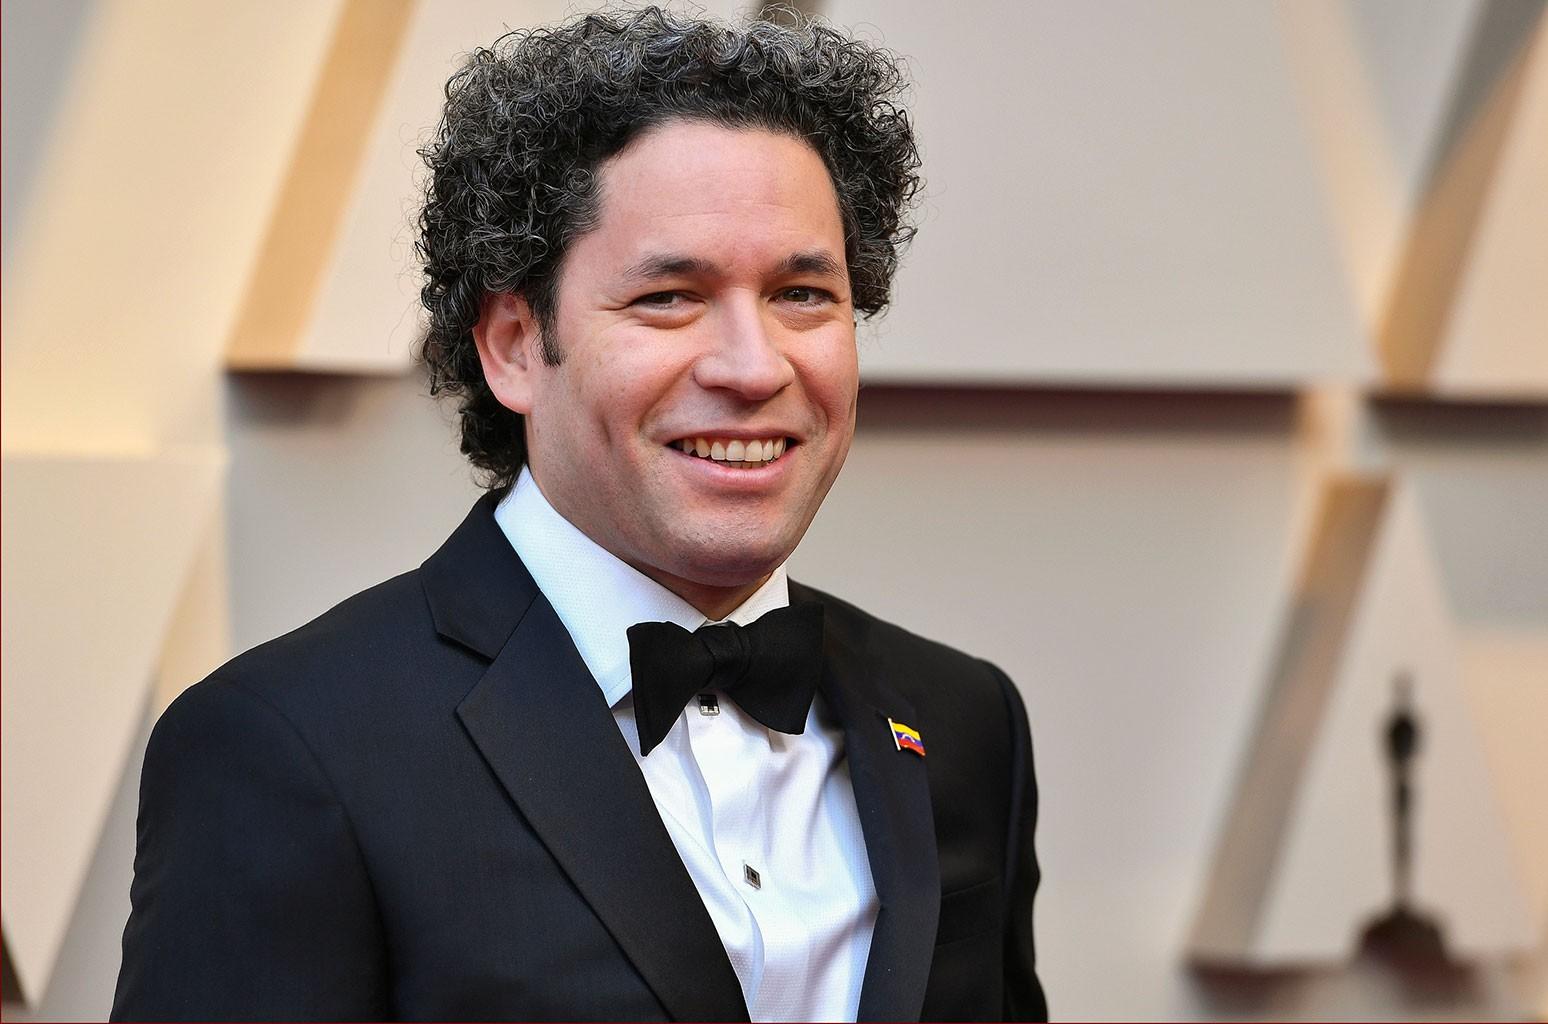 Gustavo Dudamel To Head LA Philharmonic For 5 More Years